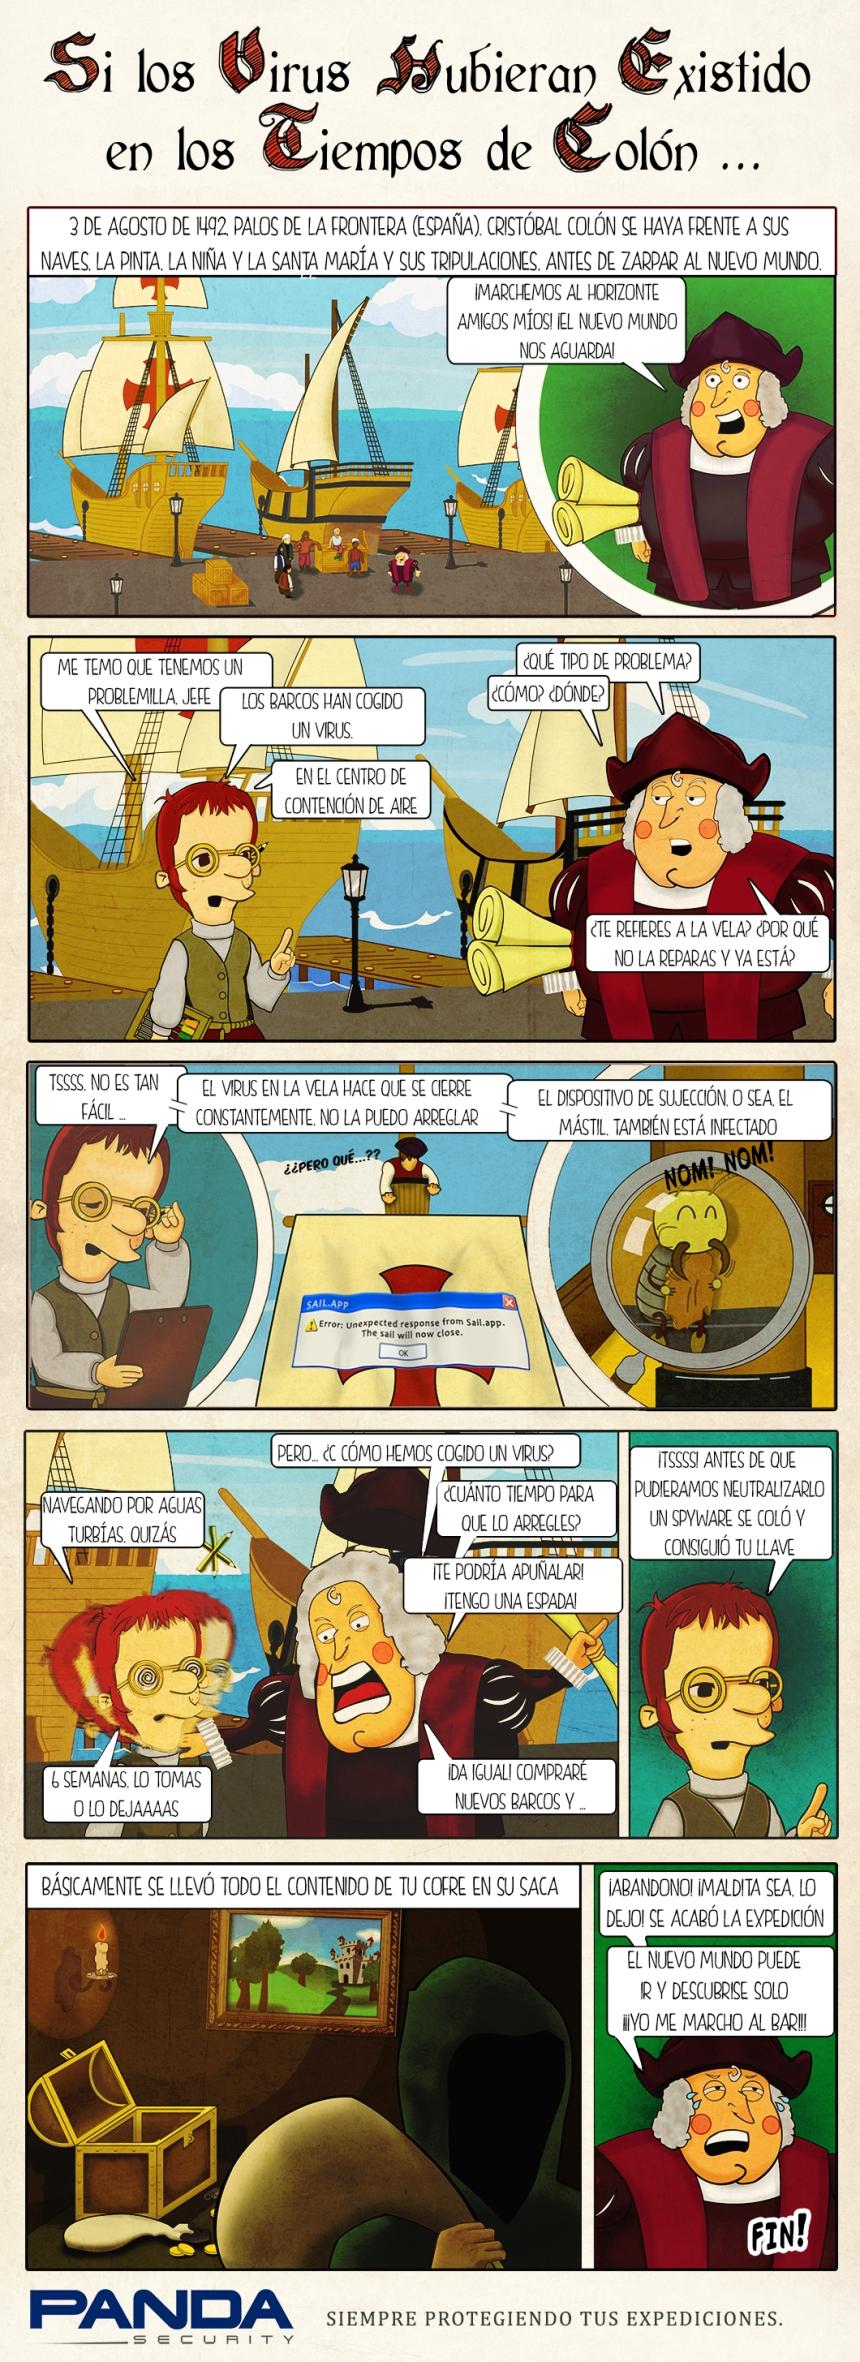 Virus informáticos en época de Colón